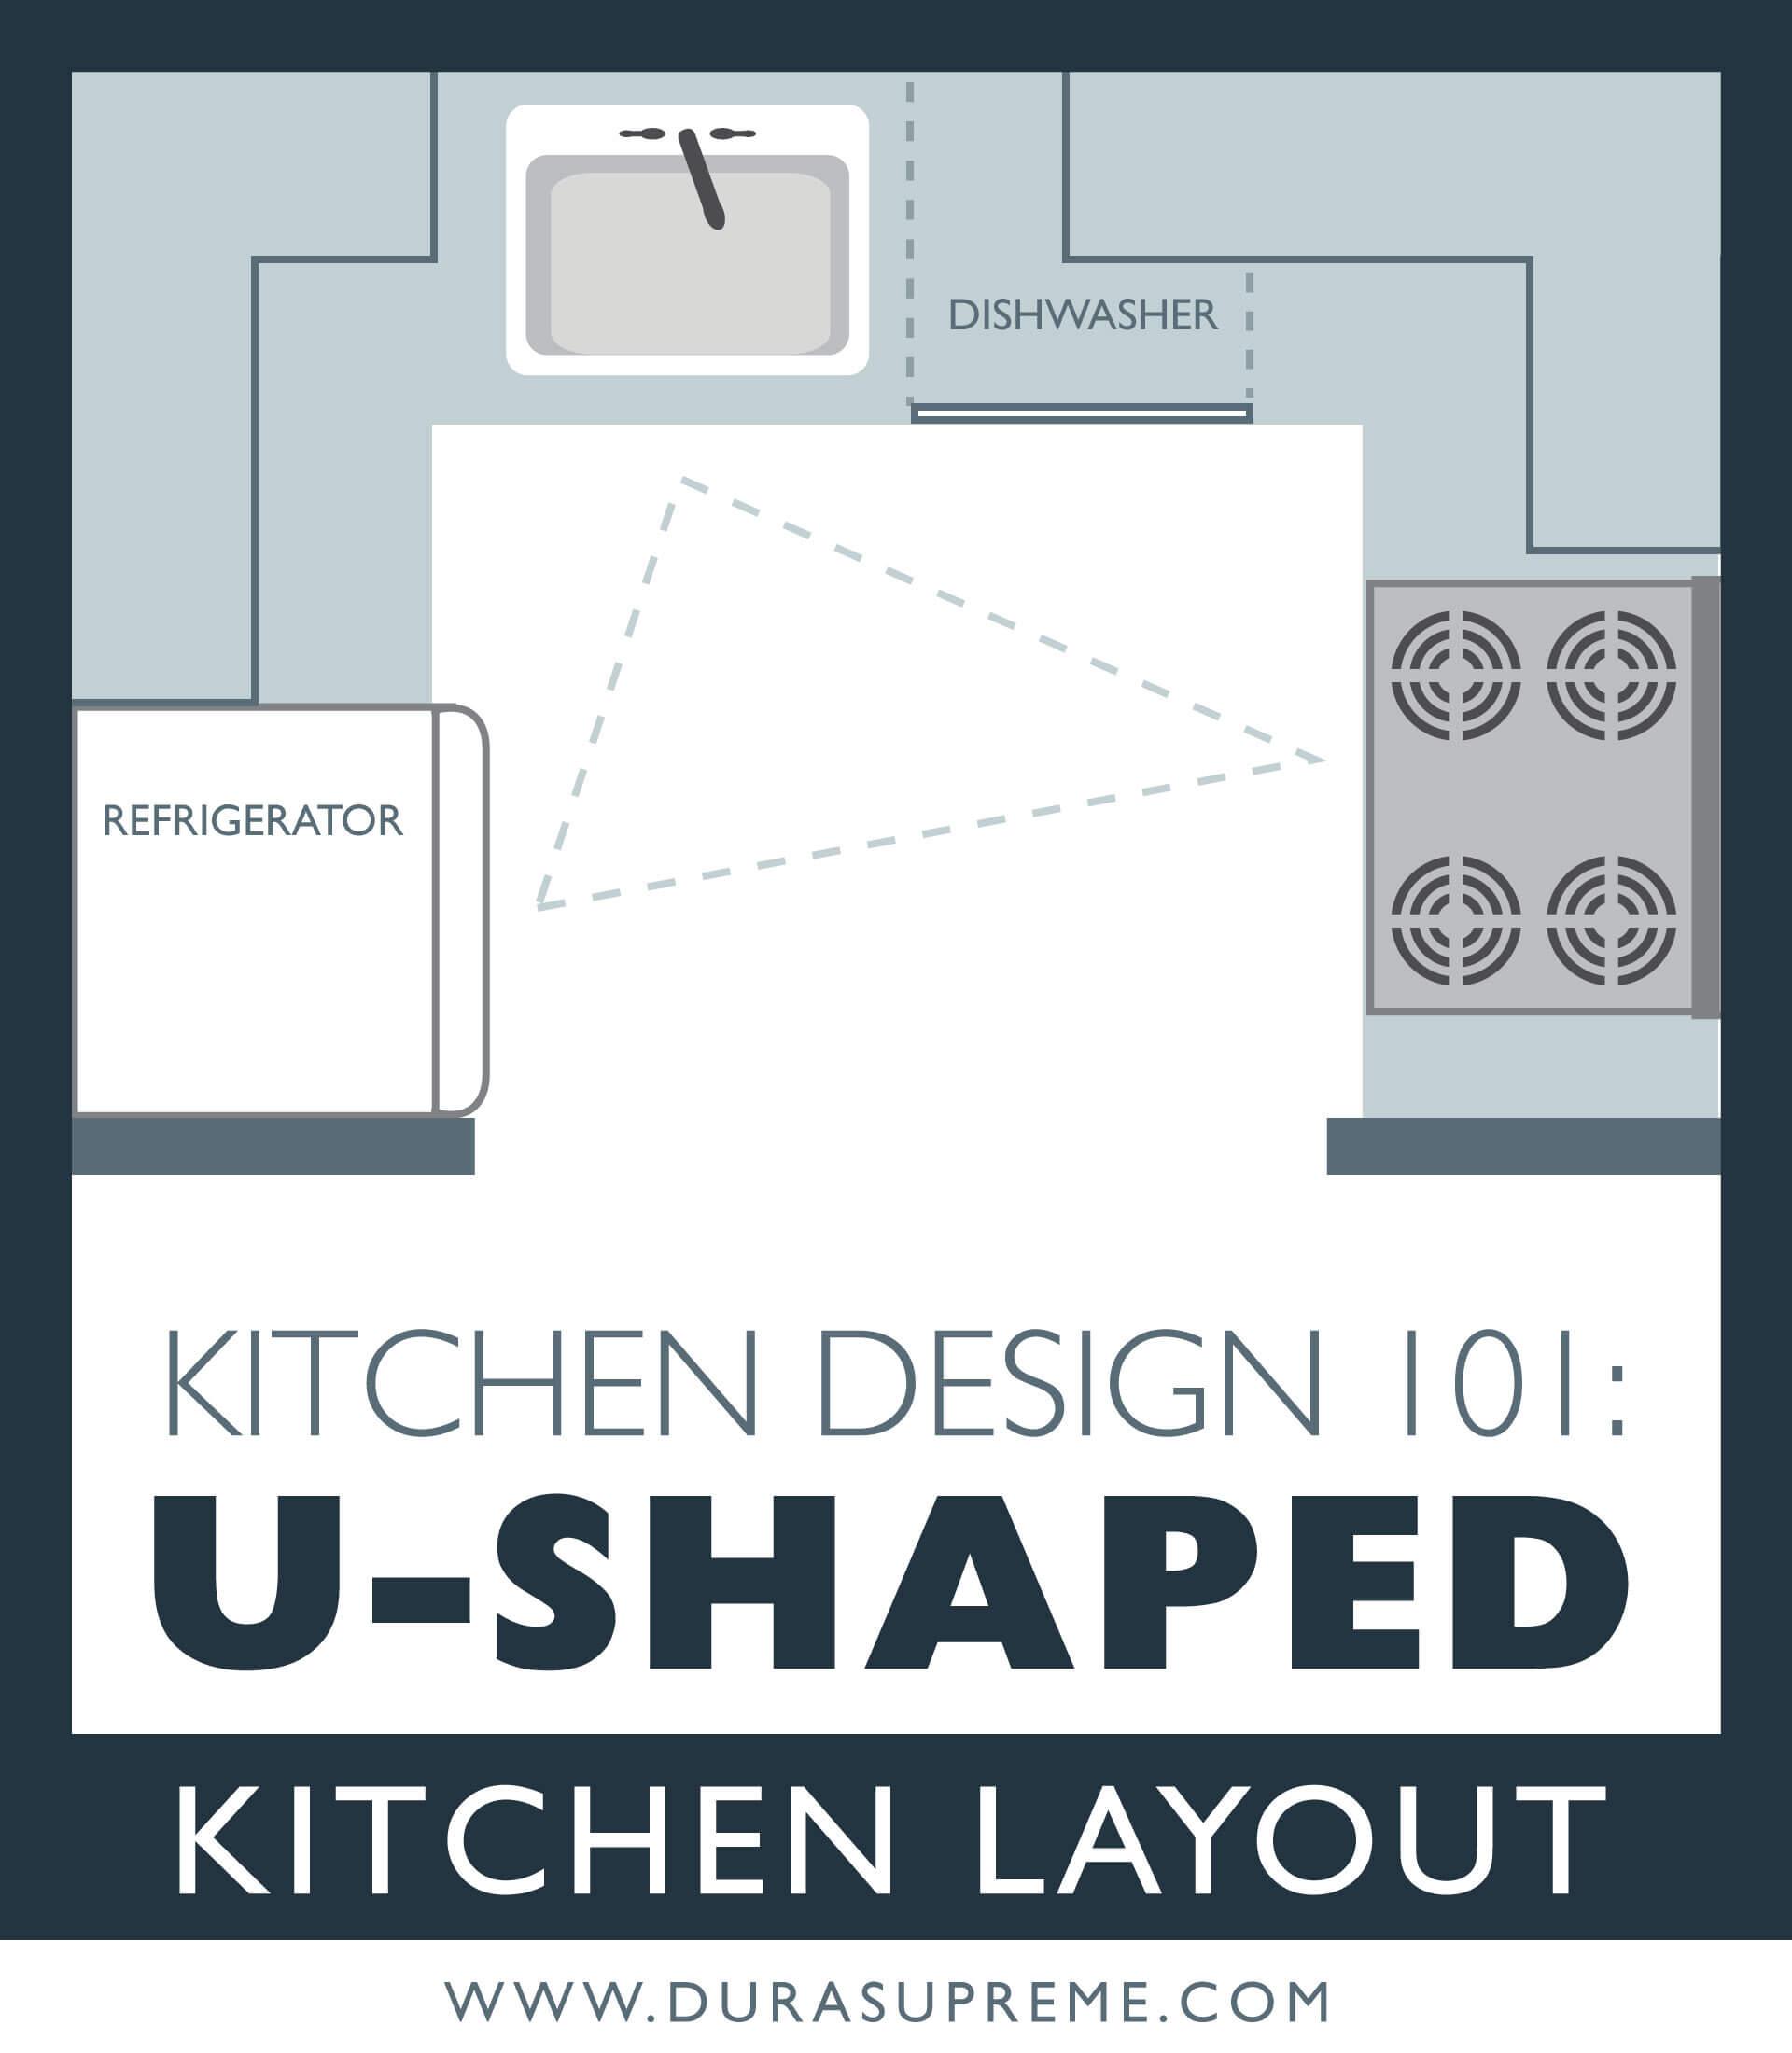 U-Shaped Kitchen Layout design tips